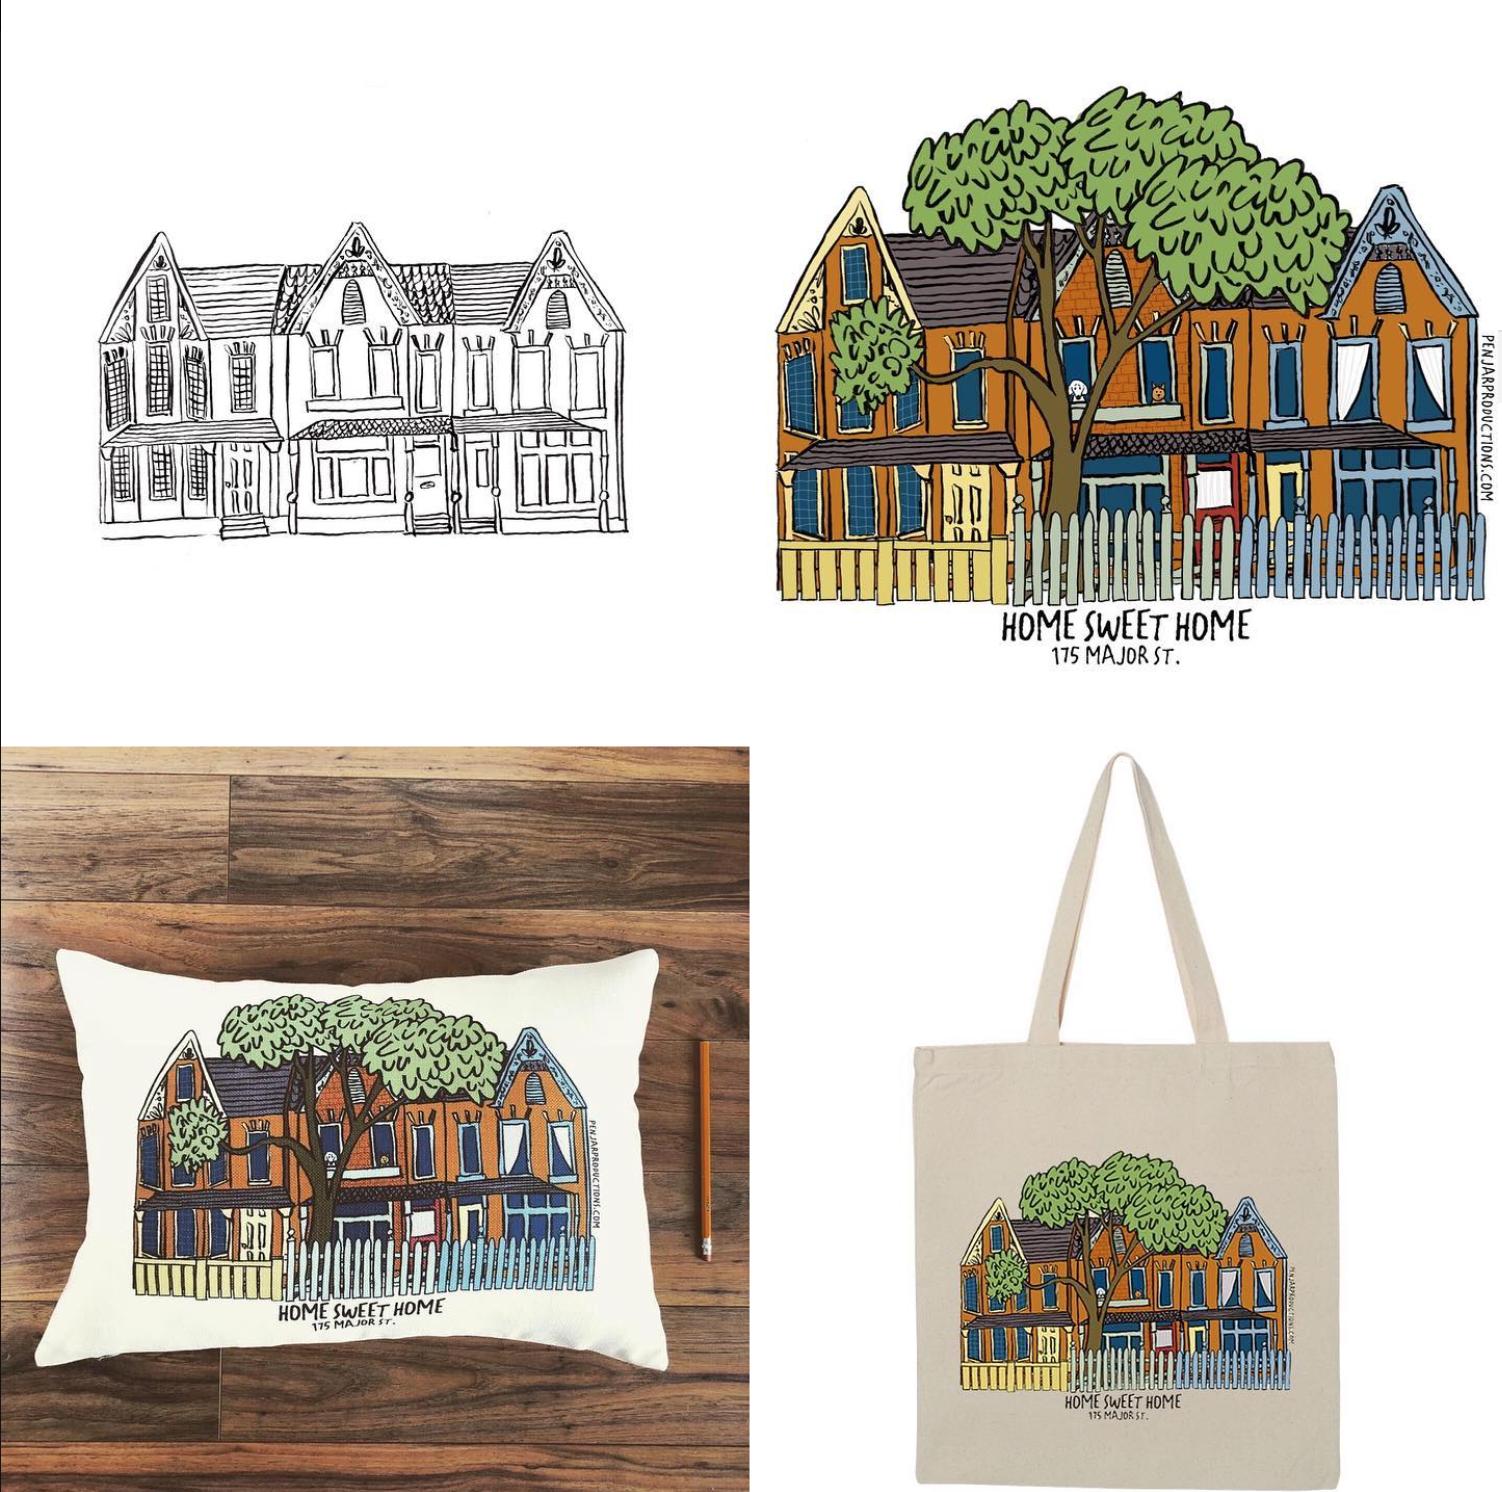 Custom house drawings by Alison Garwood-Jones